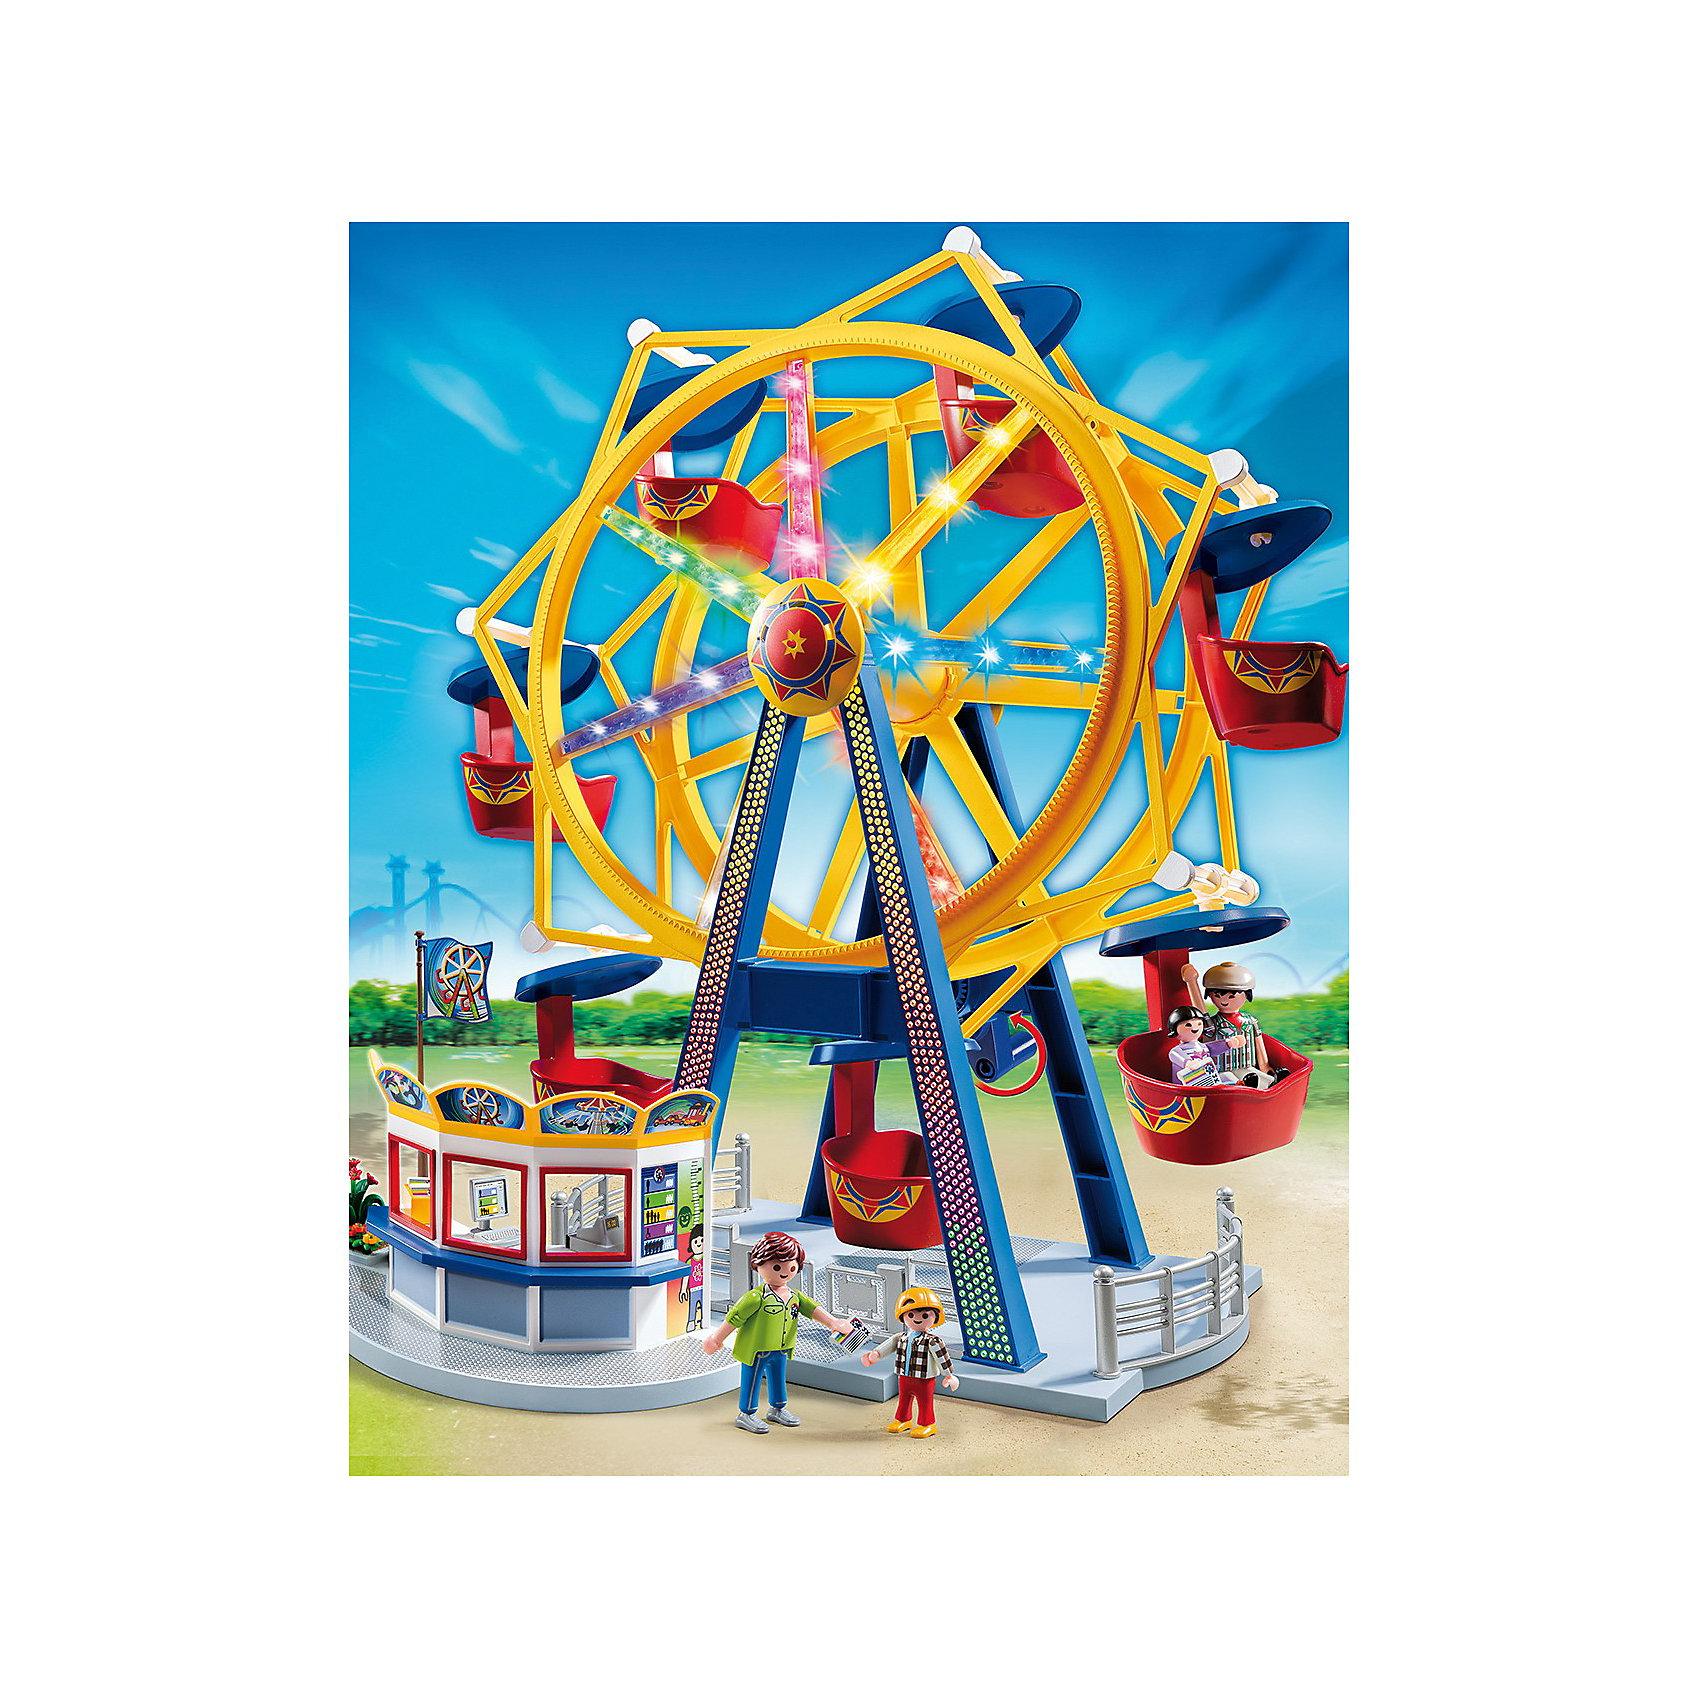 PLAYMOBIL® PLAYMOBIL 5552 Парк Развлечений: Колесо обозрения с огнями playmobil® playmobil 5546 парк развлечений продавец шаров smileyworld